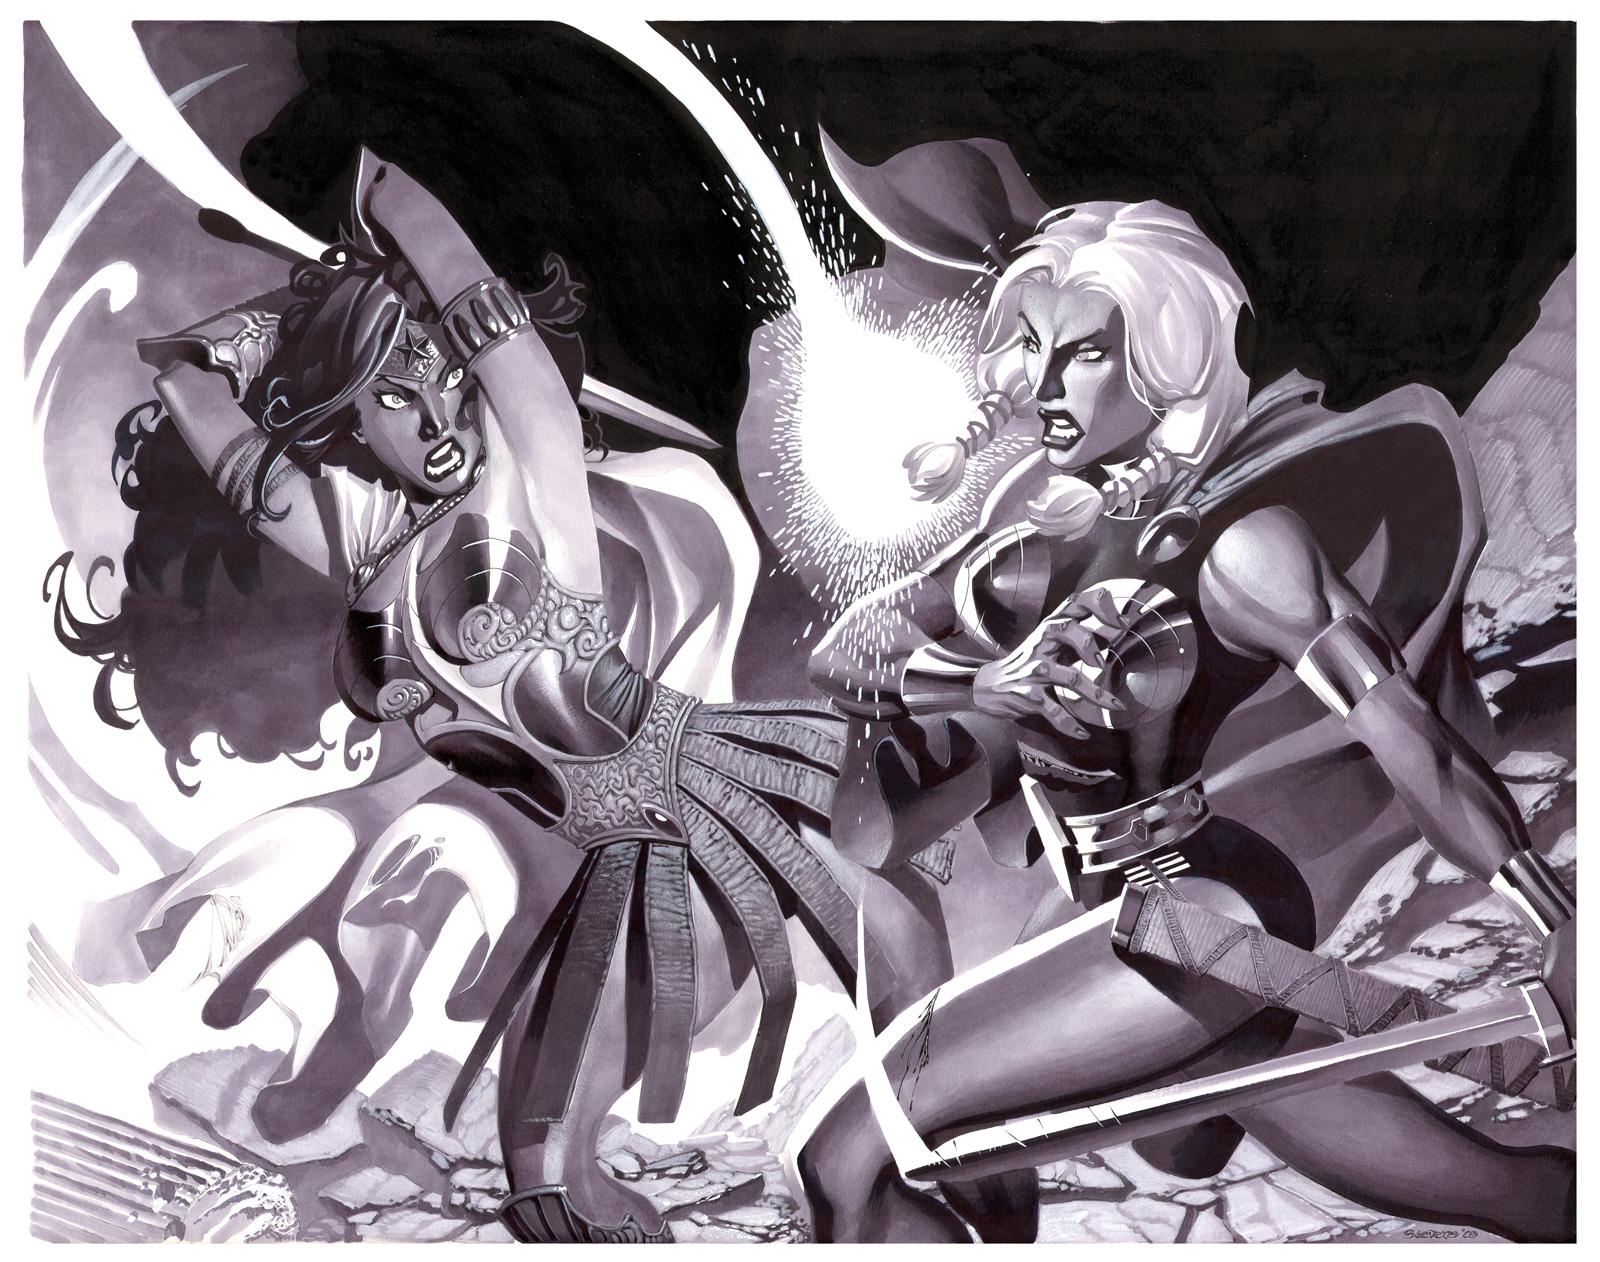 Wonder Woman VS Valkyrie by ChristopherStevens